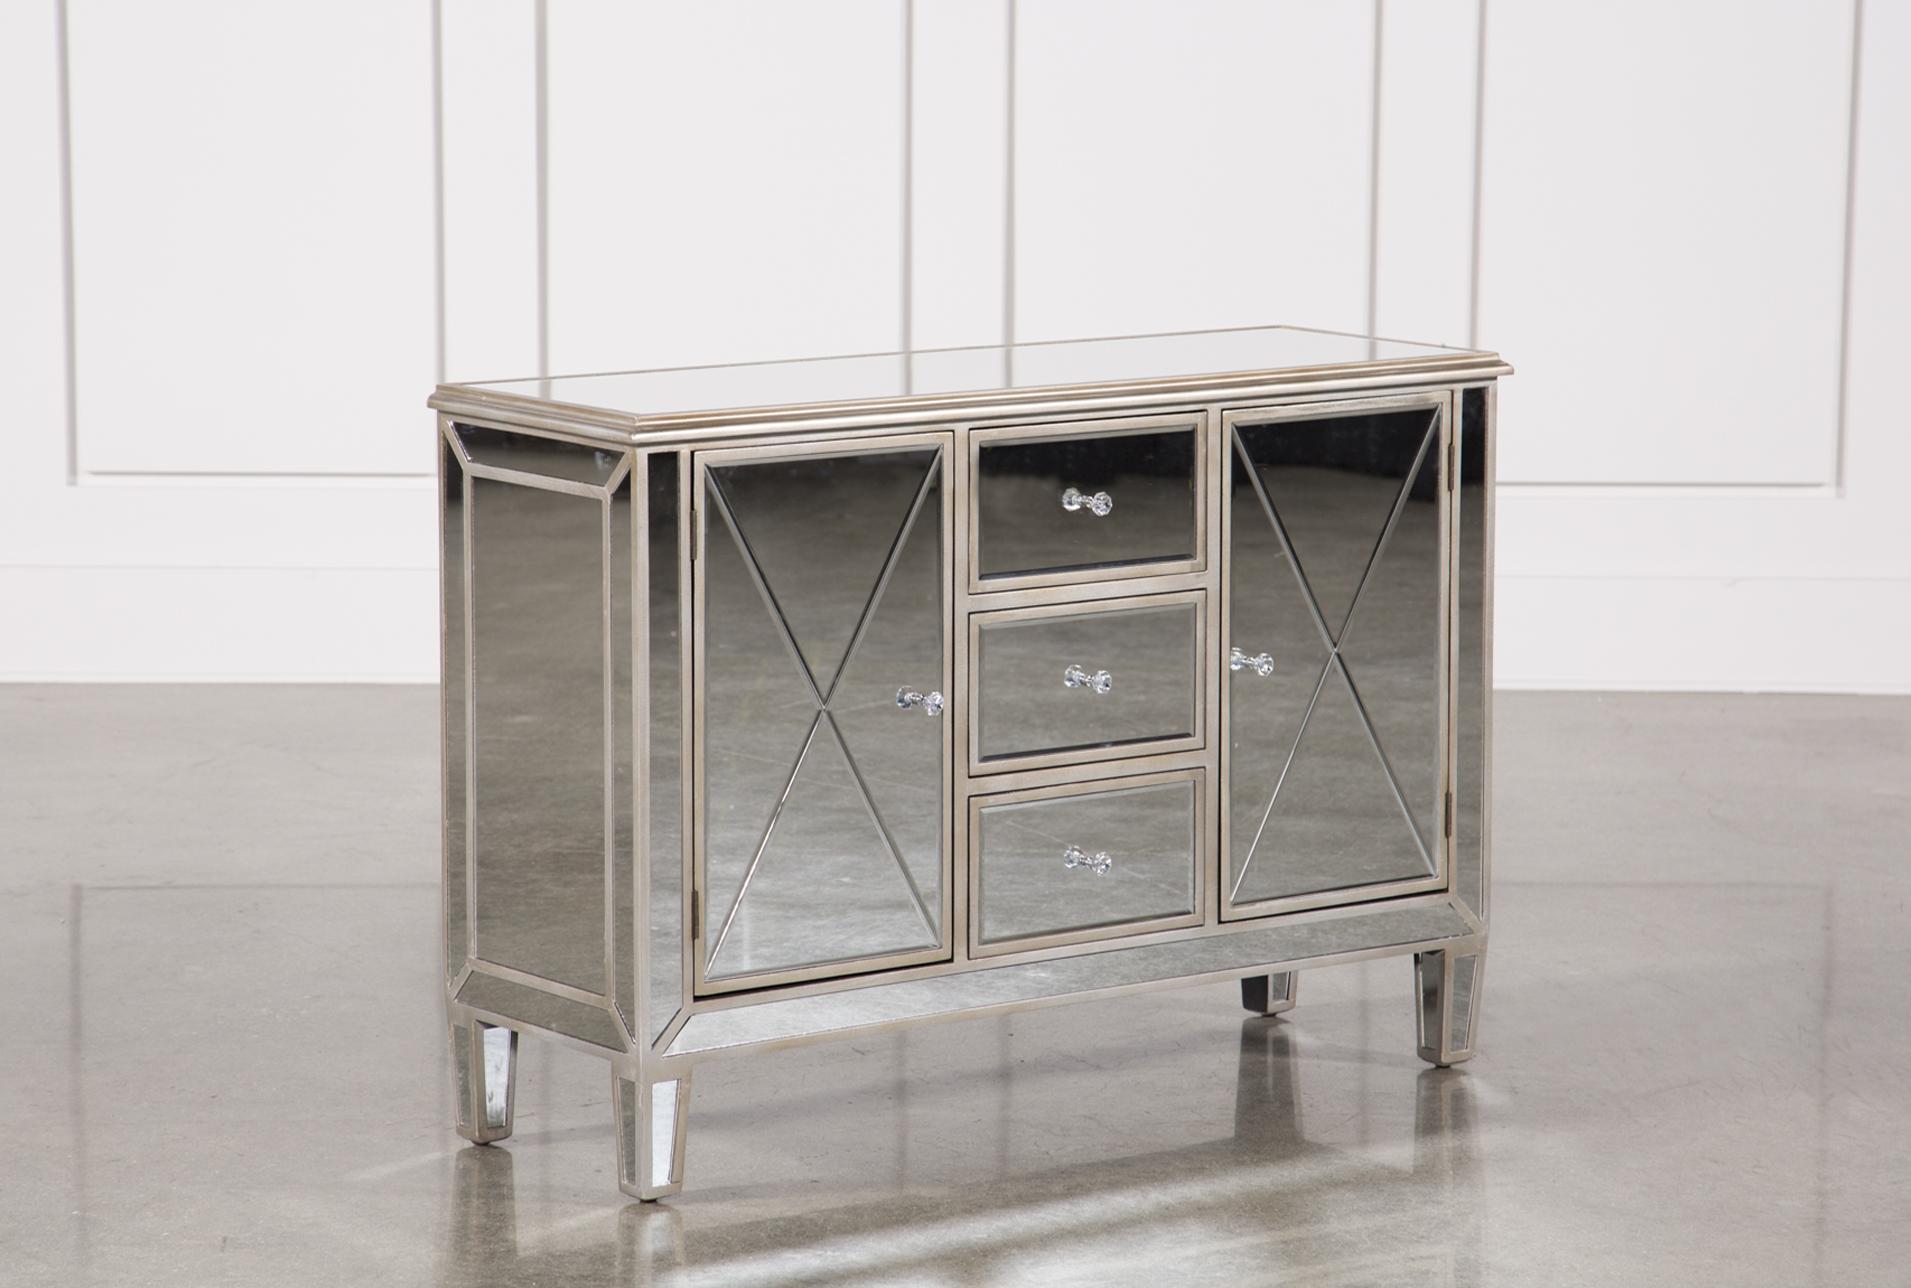 Mirrorred furniture Interior Design Hayworth Mirrored Dresser Living Spaces Hayworth Mirrored Dresser Living Spaces